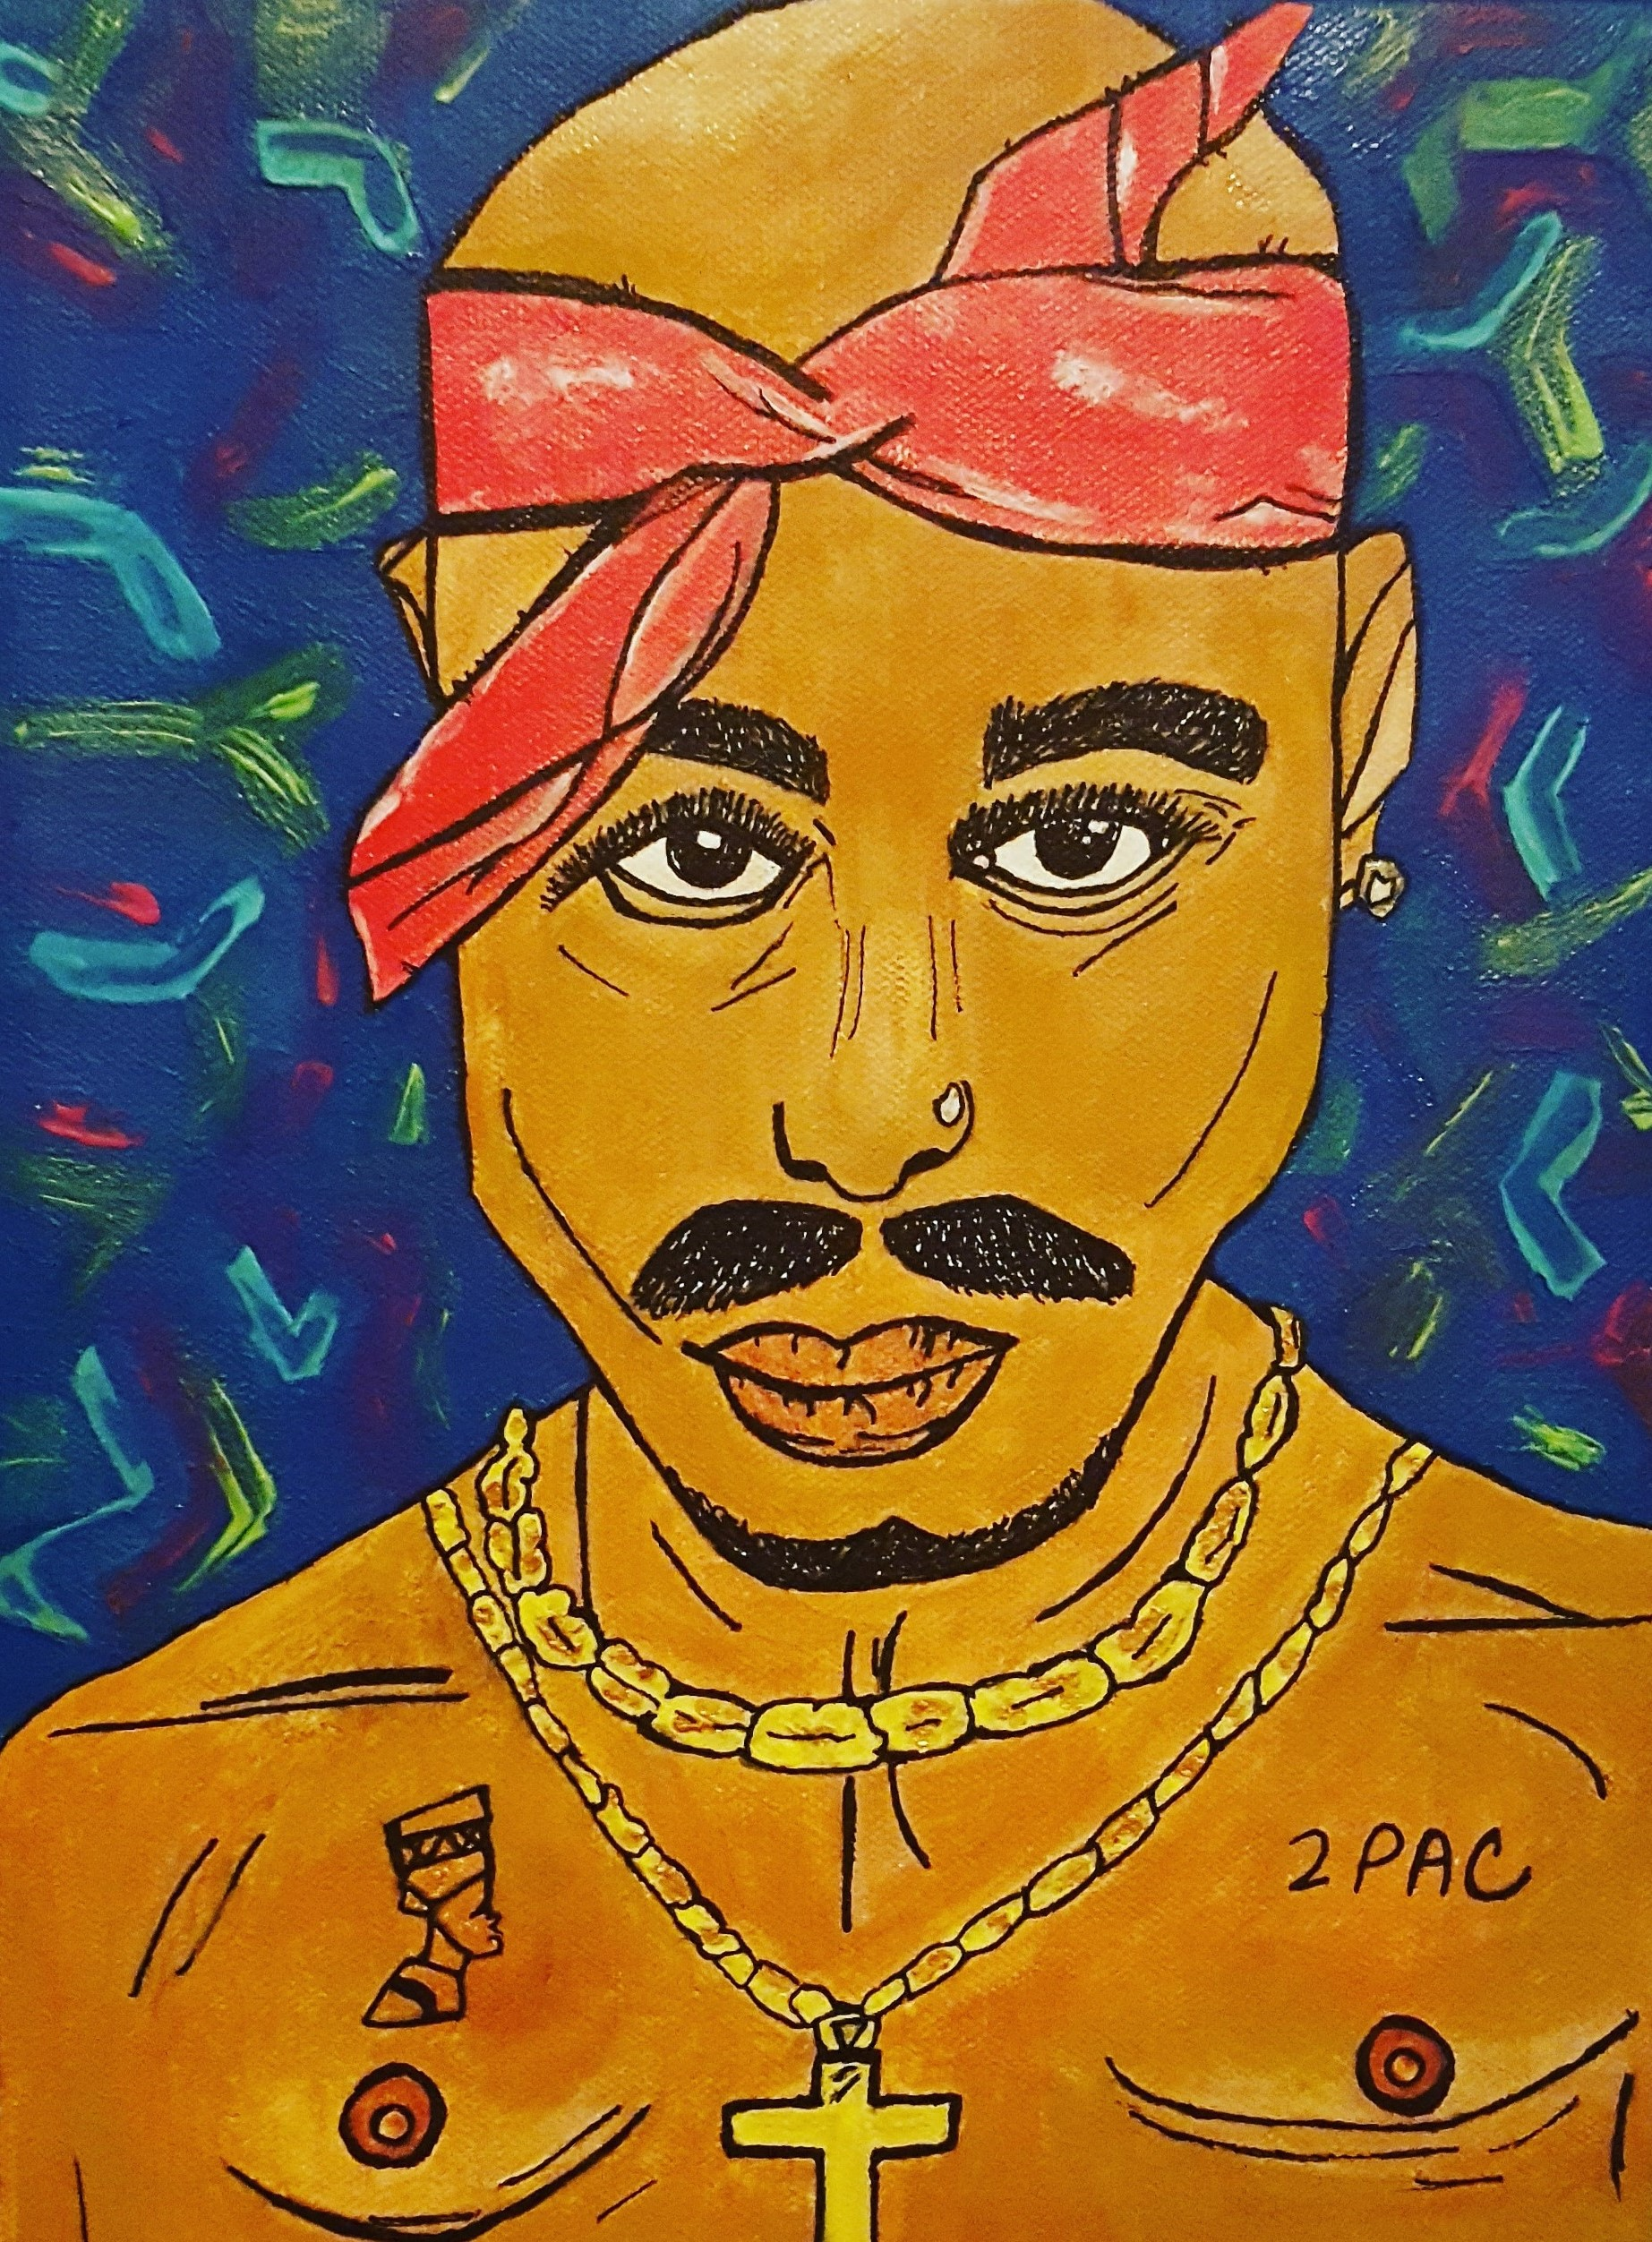 Tupac sticker.jpg